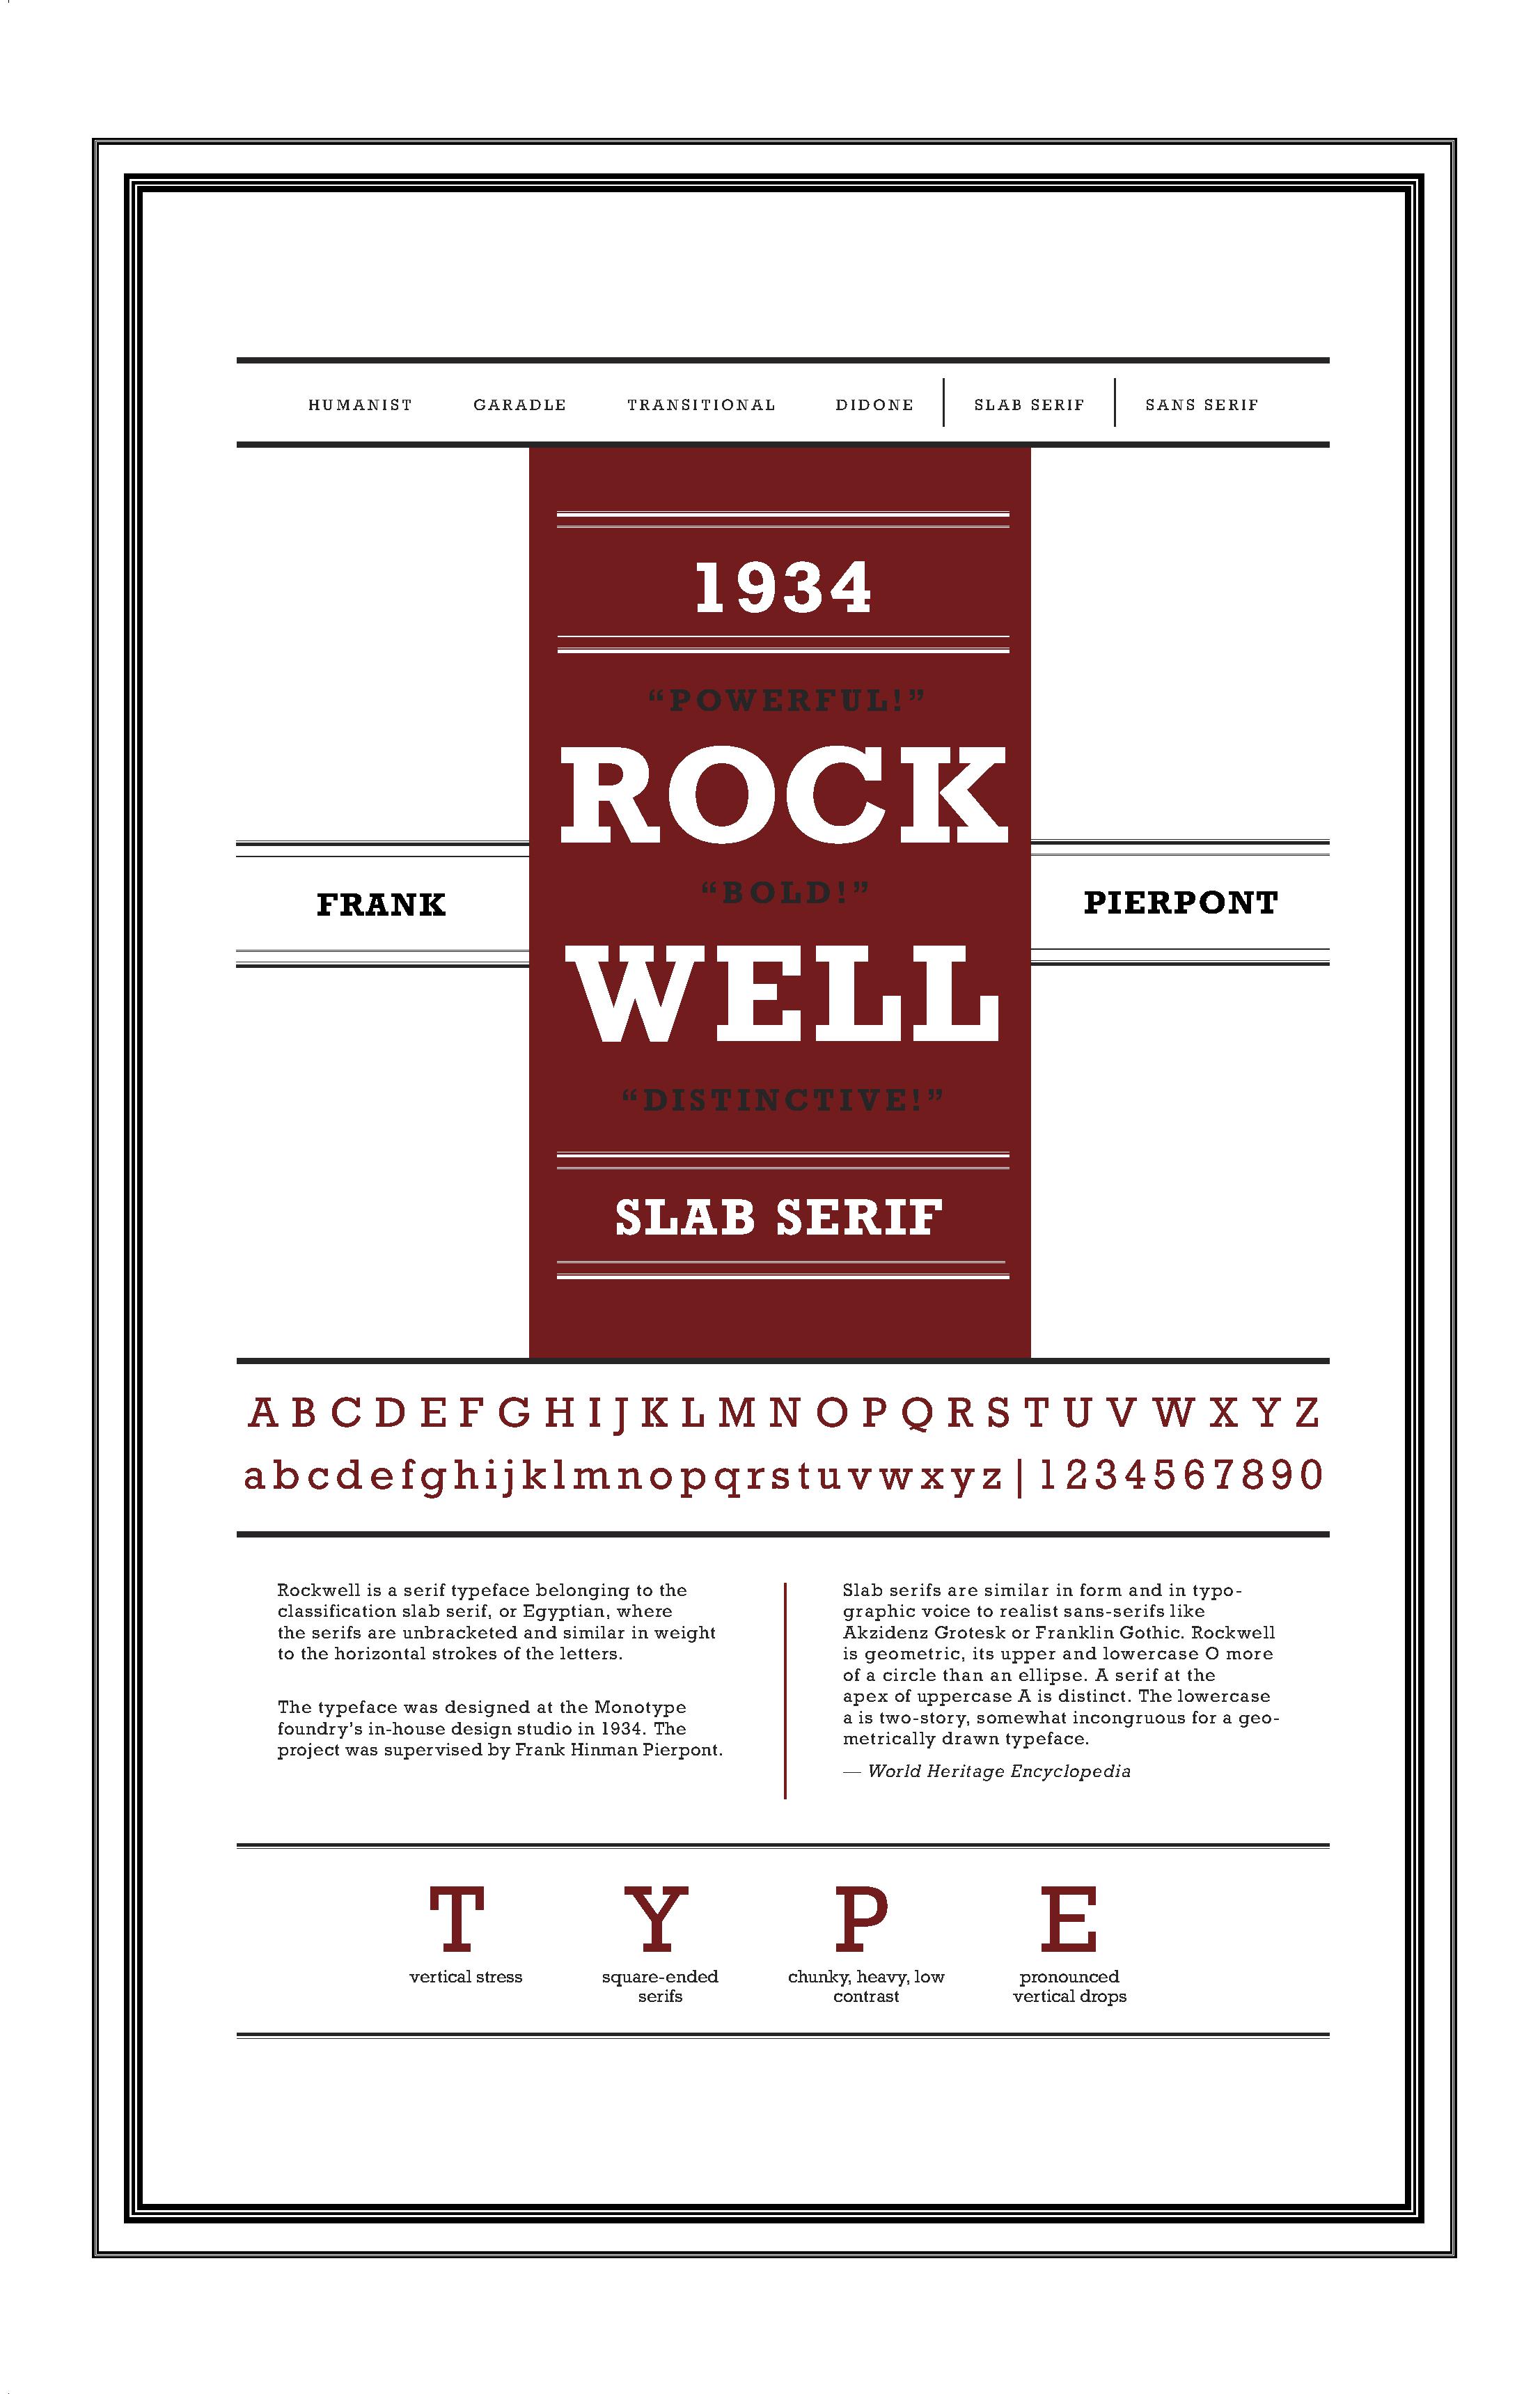 RockwellFinal.png